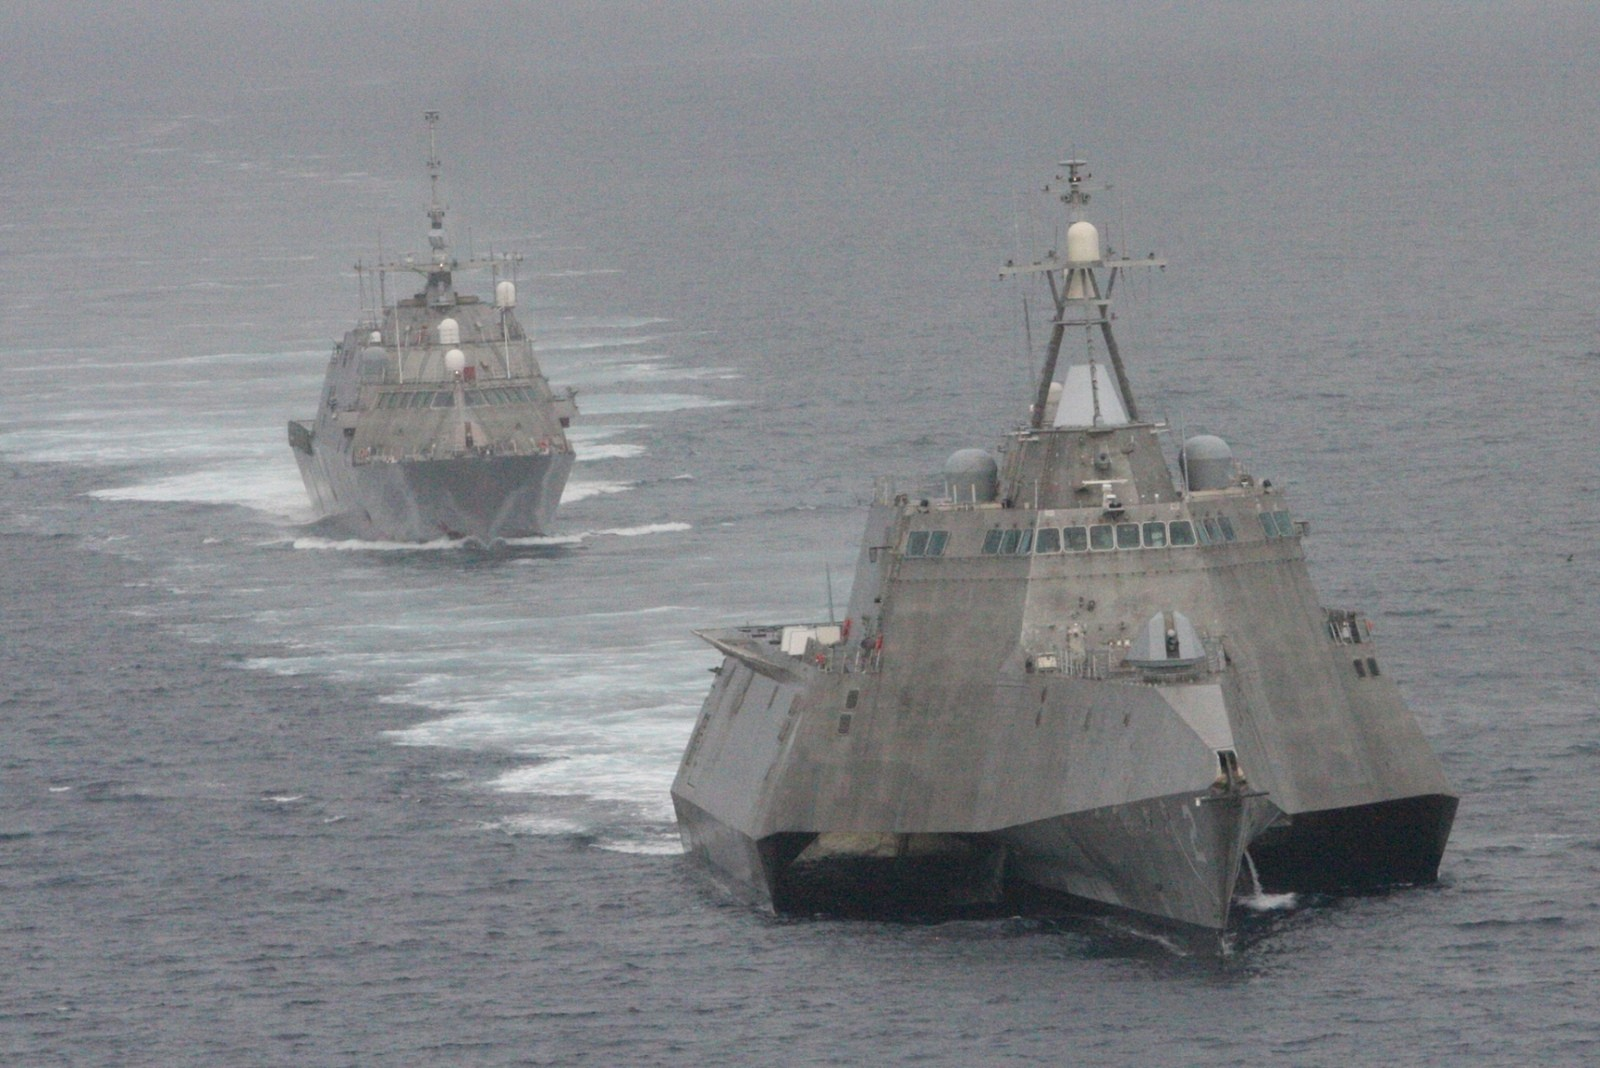 RIMPAC 훈련에 불참하는 미 해군의 연안전투함